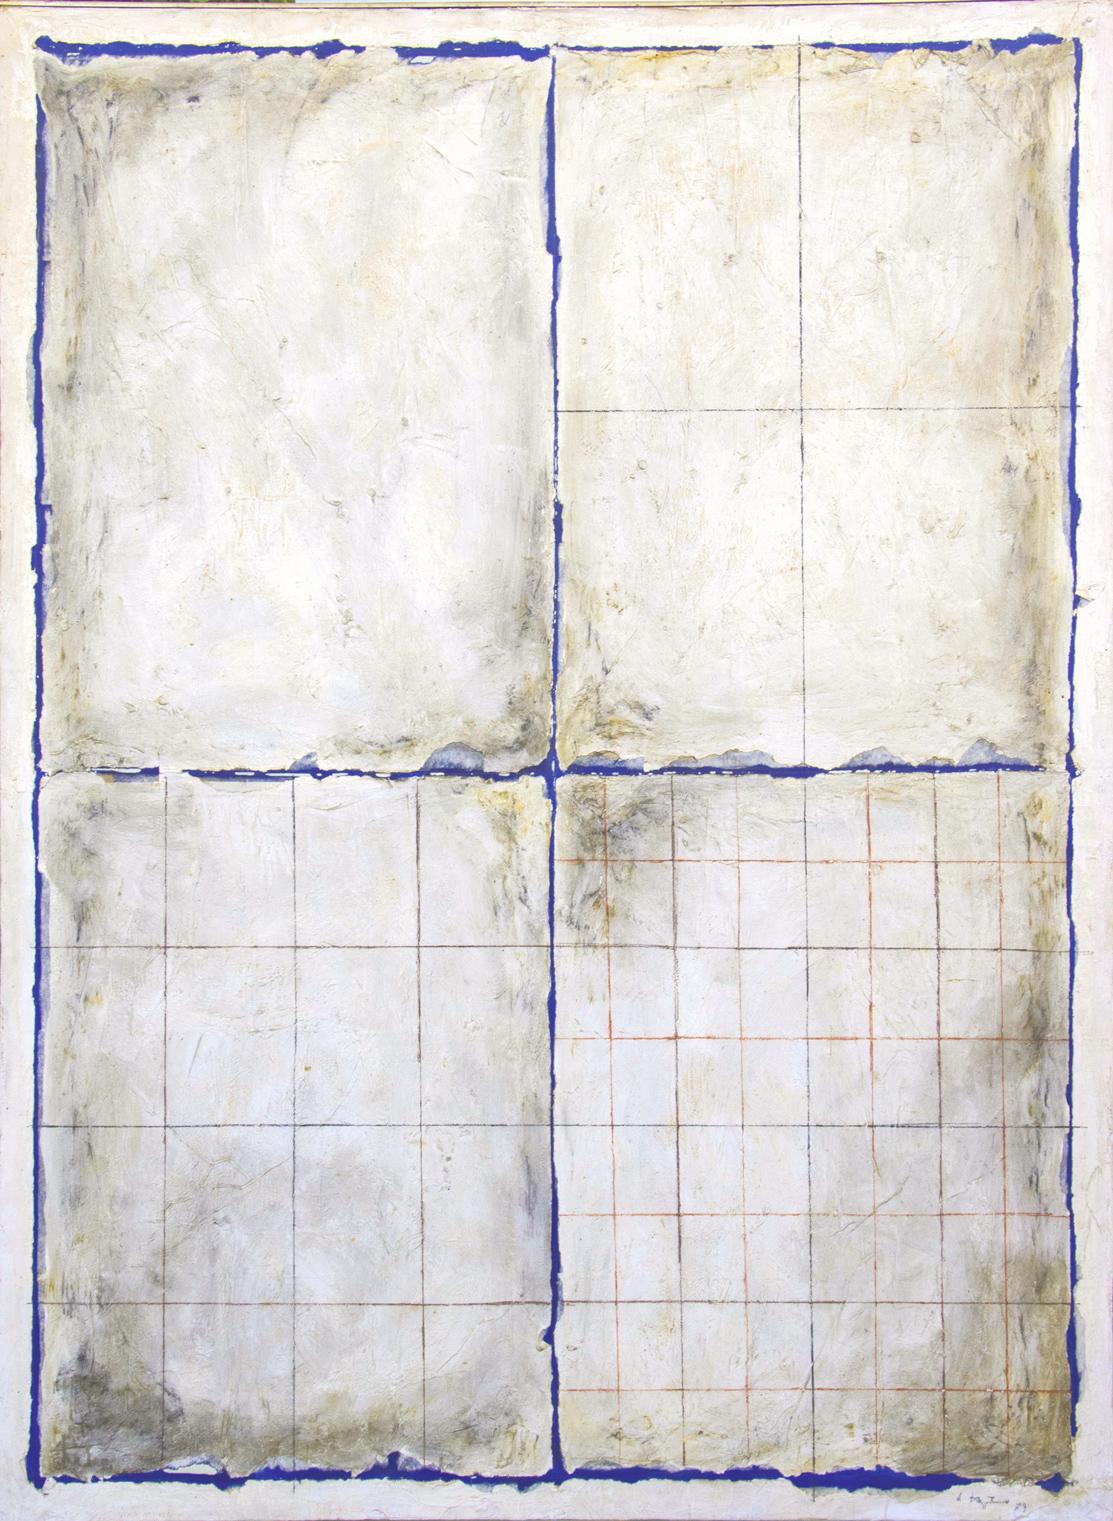 D'Agostino-Antonio_Intonaco_1973_tecnica-mista-su-tela_200x150cm_e